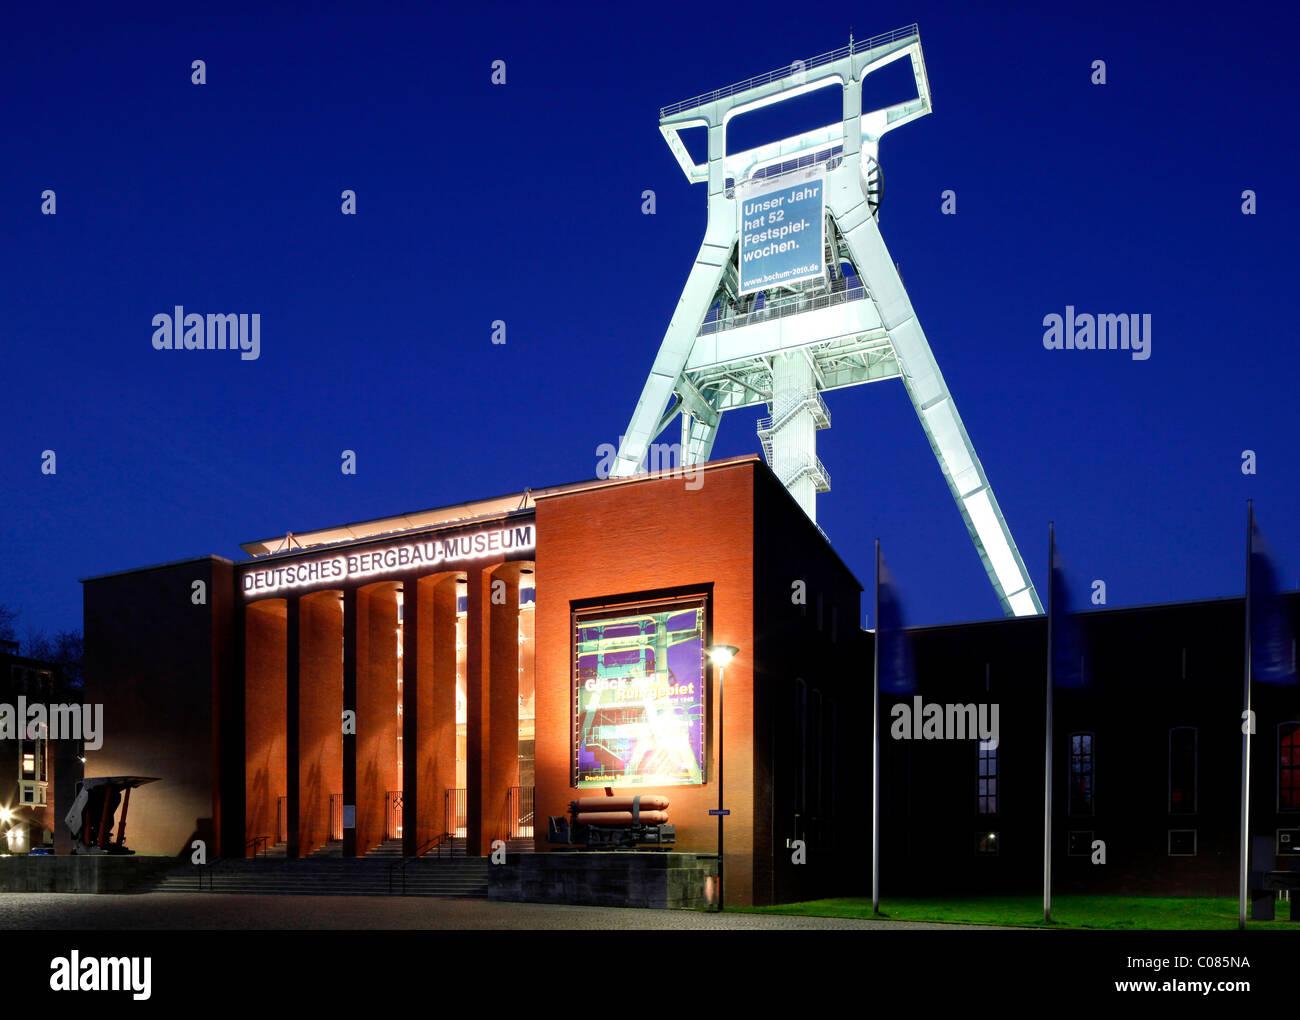 German Mining Museum, Bochum, Ruhr Area, North Rhine-Westphalia, Germany, Europe - Stock Image